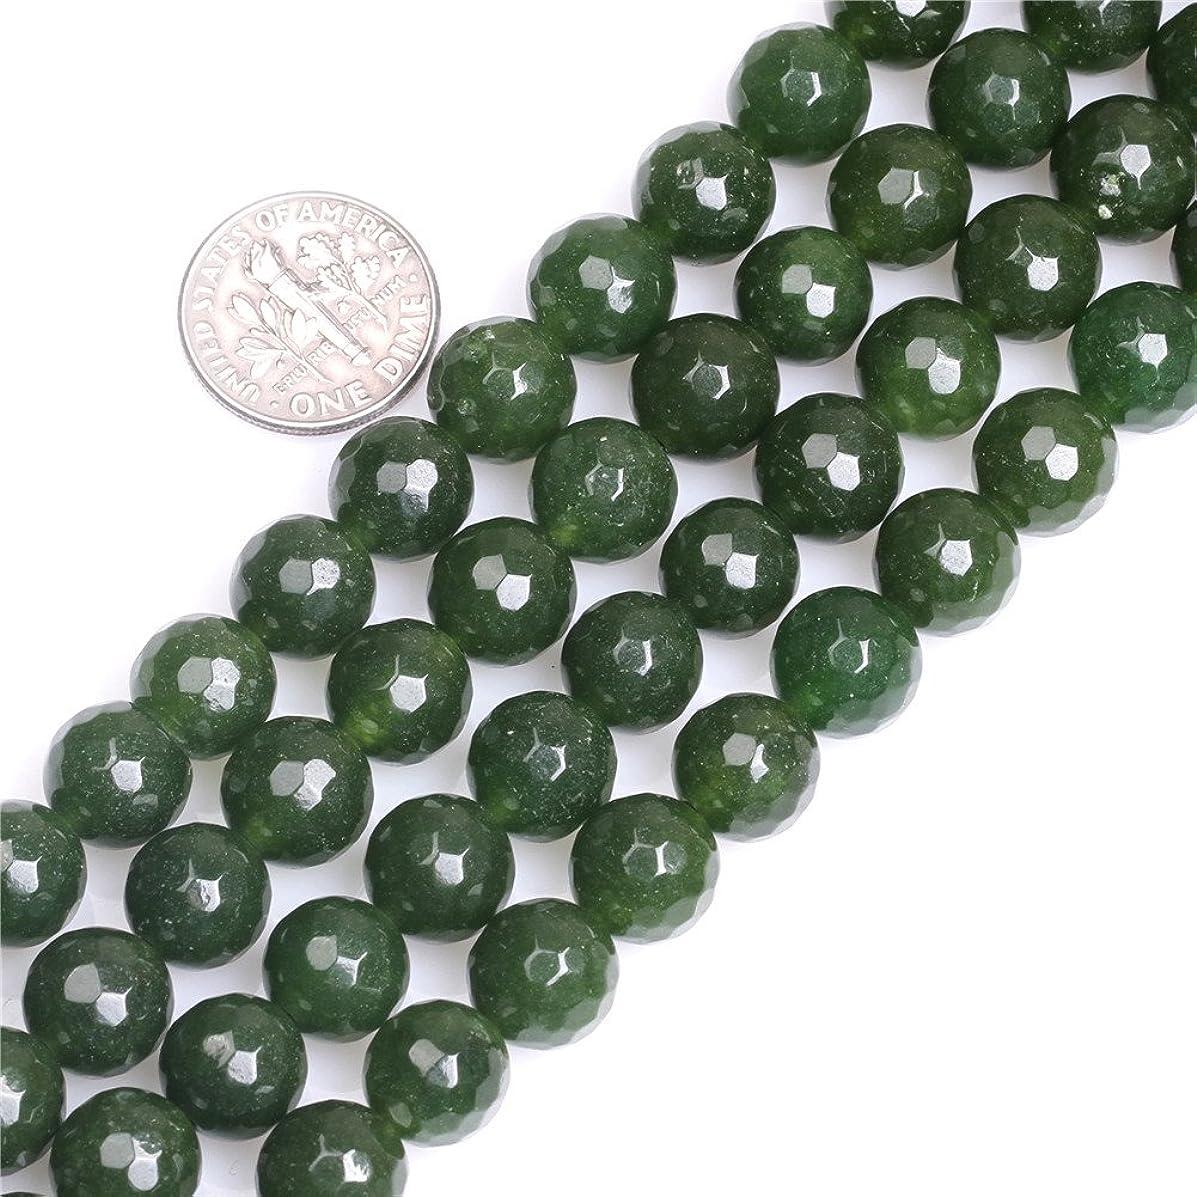 JOE FOREMAN 10mm Taiwan Jade Green Semi Precious Gemstone Round Faceted Loose Beads for Jewelry Making DIY Handmade Craft Supplies 15